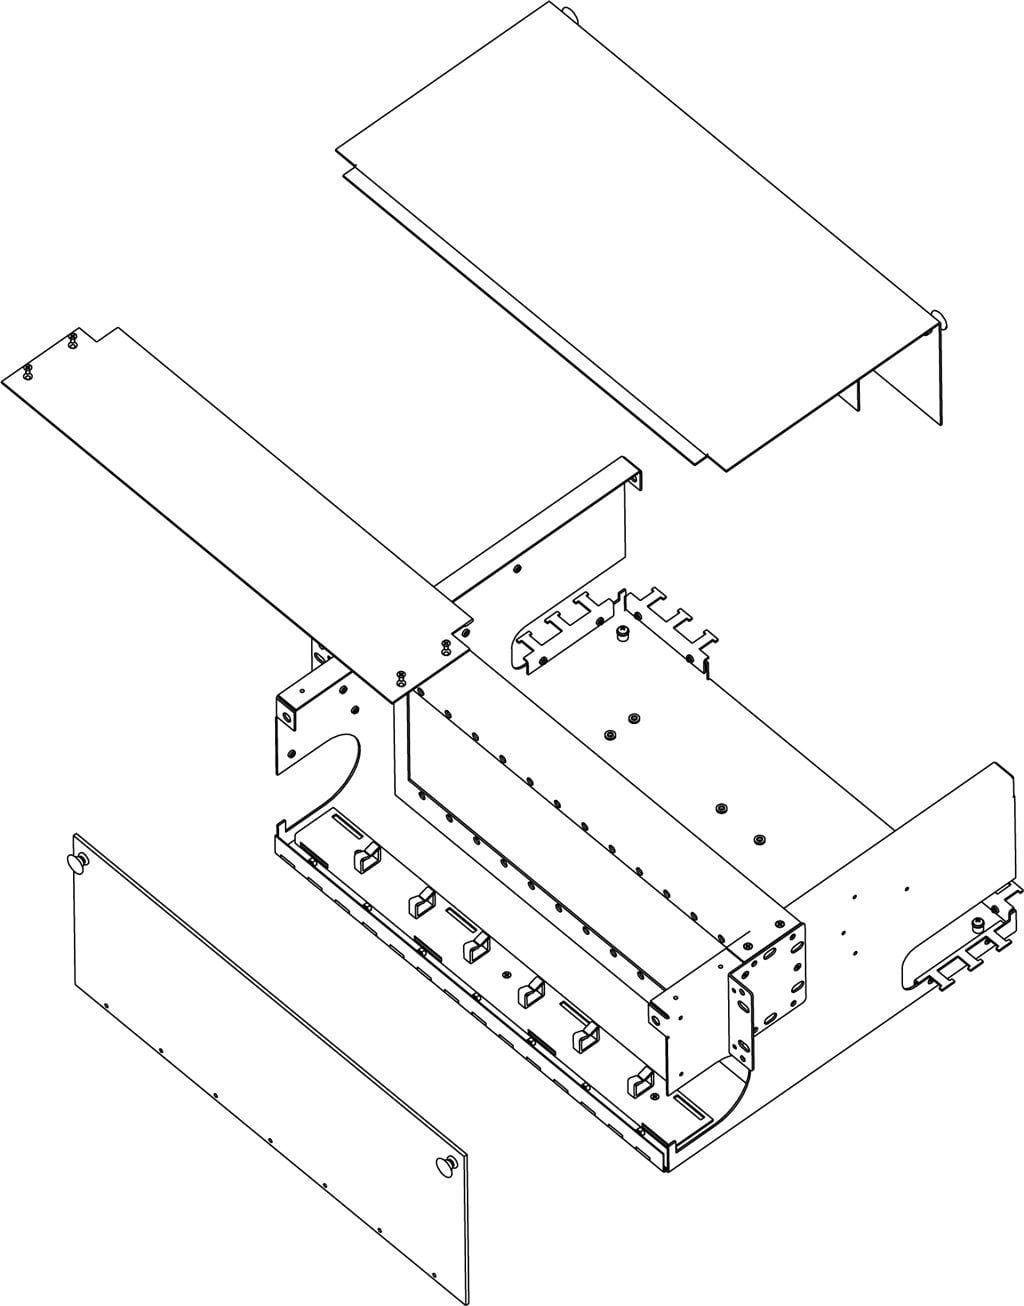 WC-4U12P-drawing